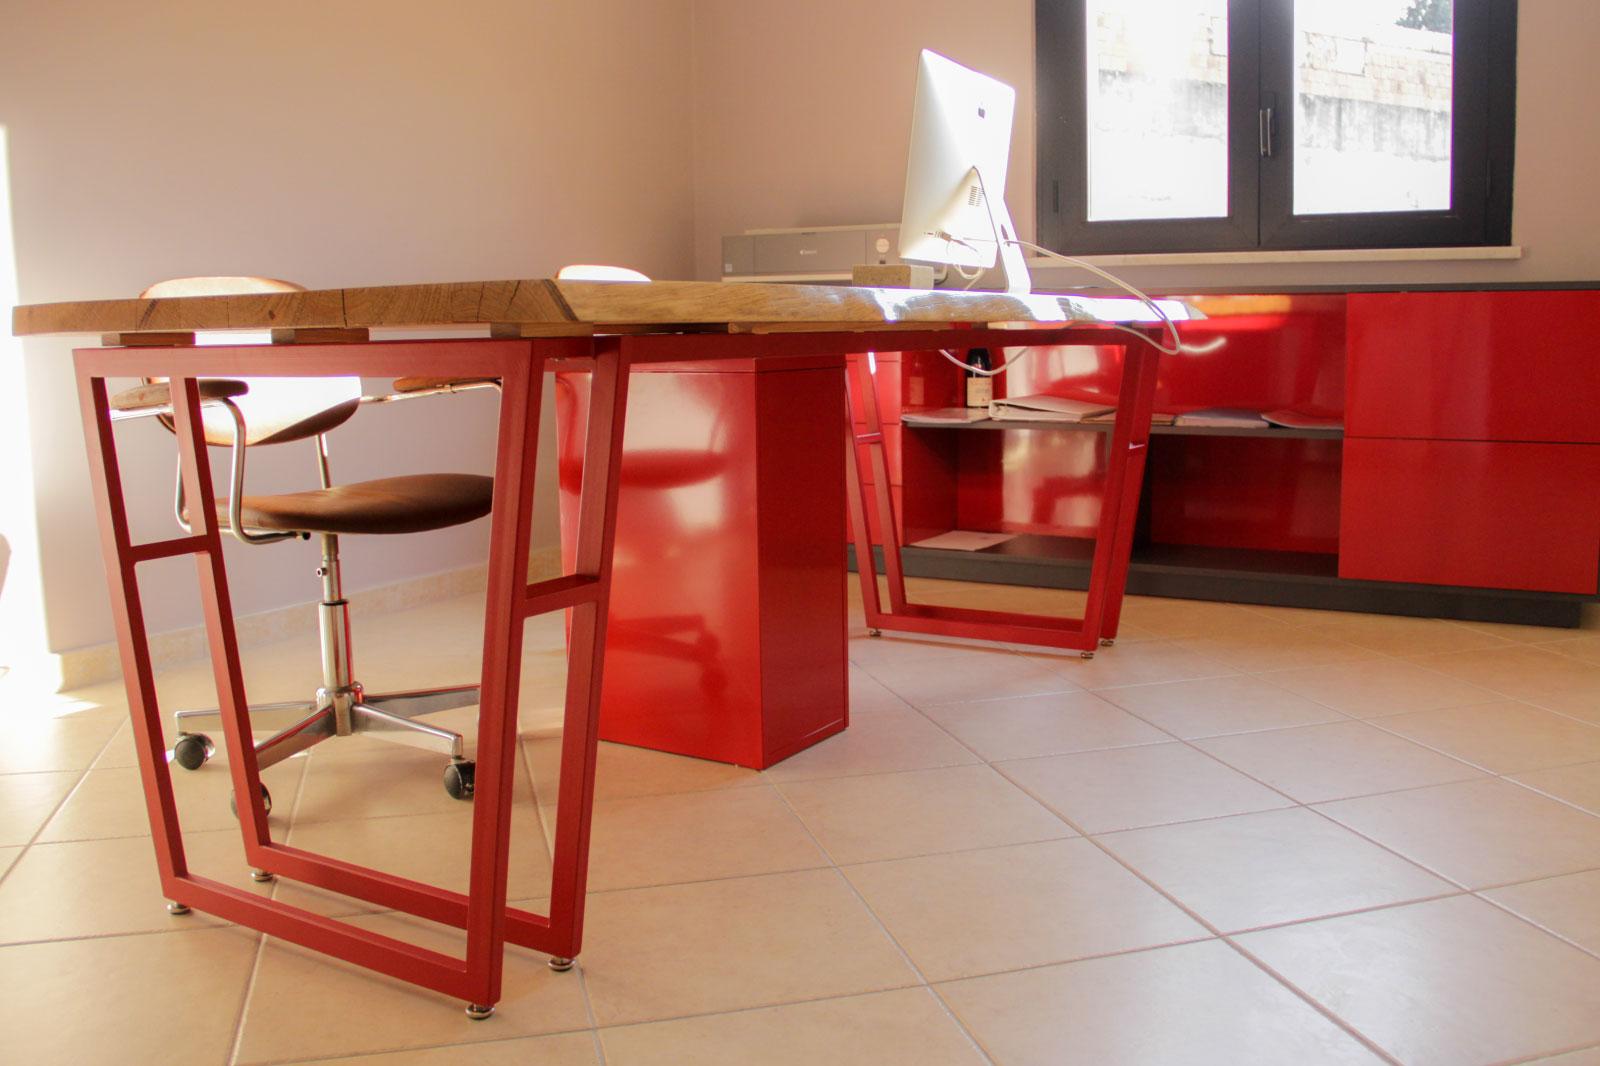 Woodesk | ArchiStudio502